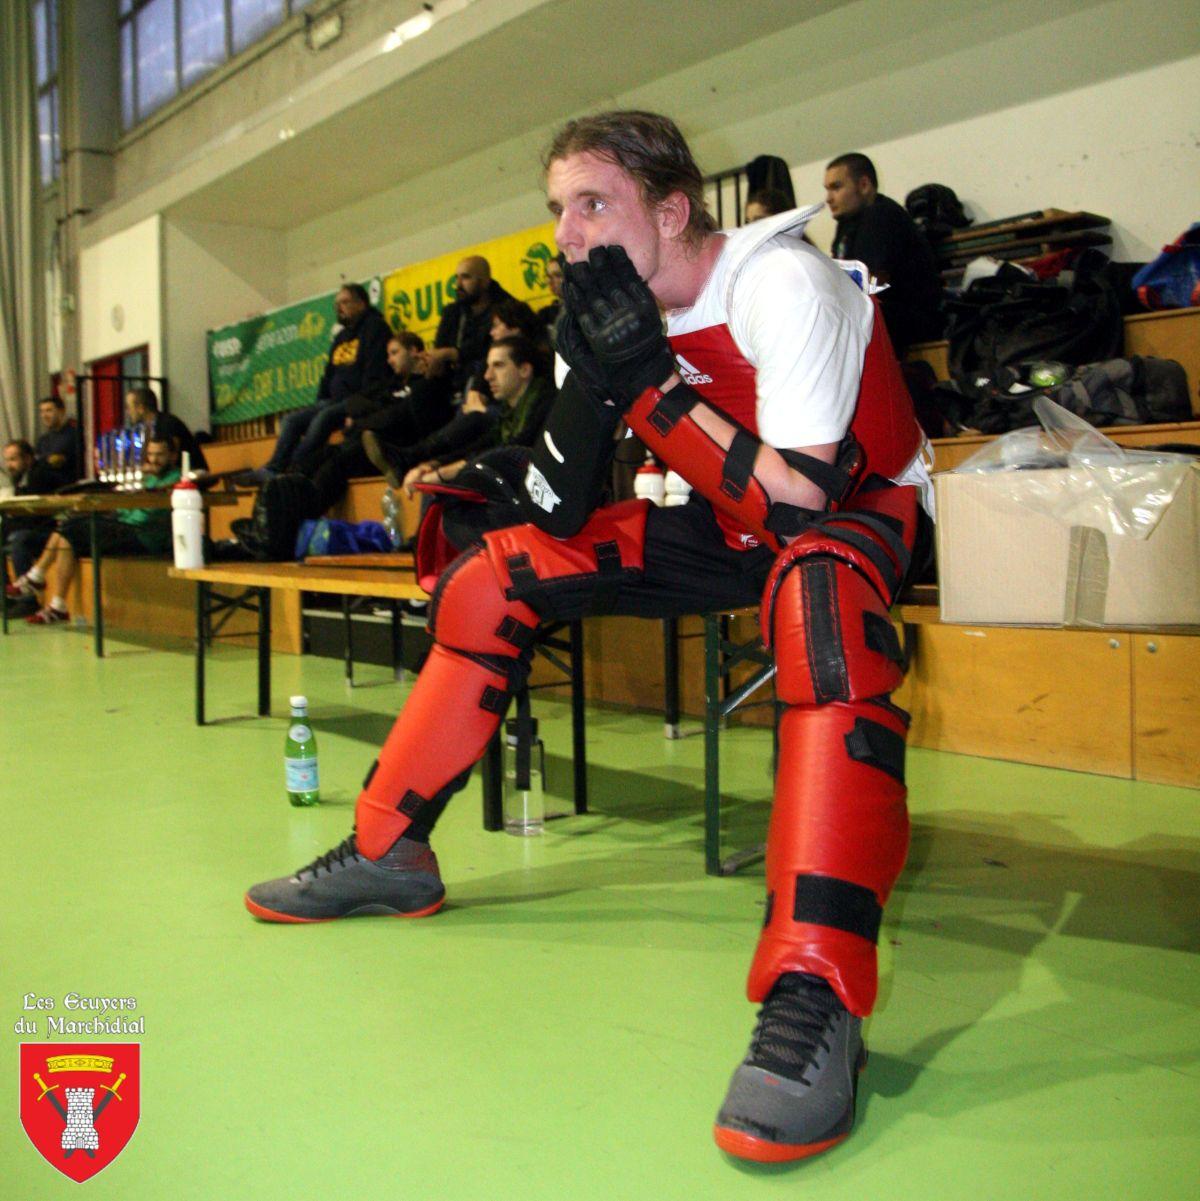 2017-11-17-Tournoi-MSF-Turin-09-marchidial.fr_